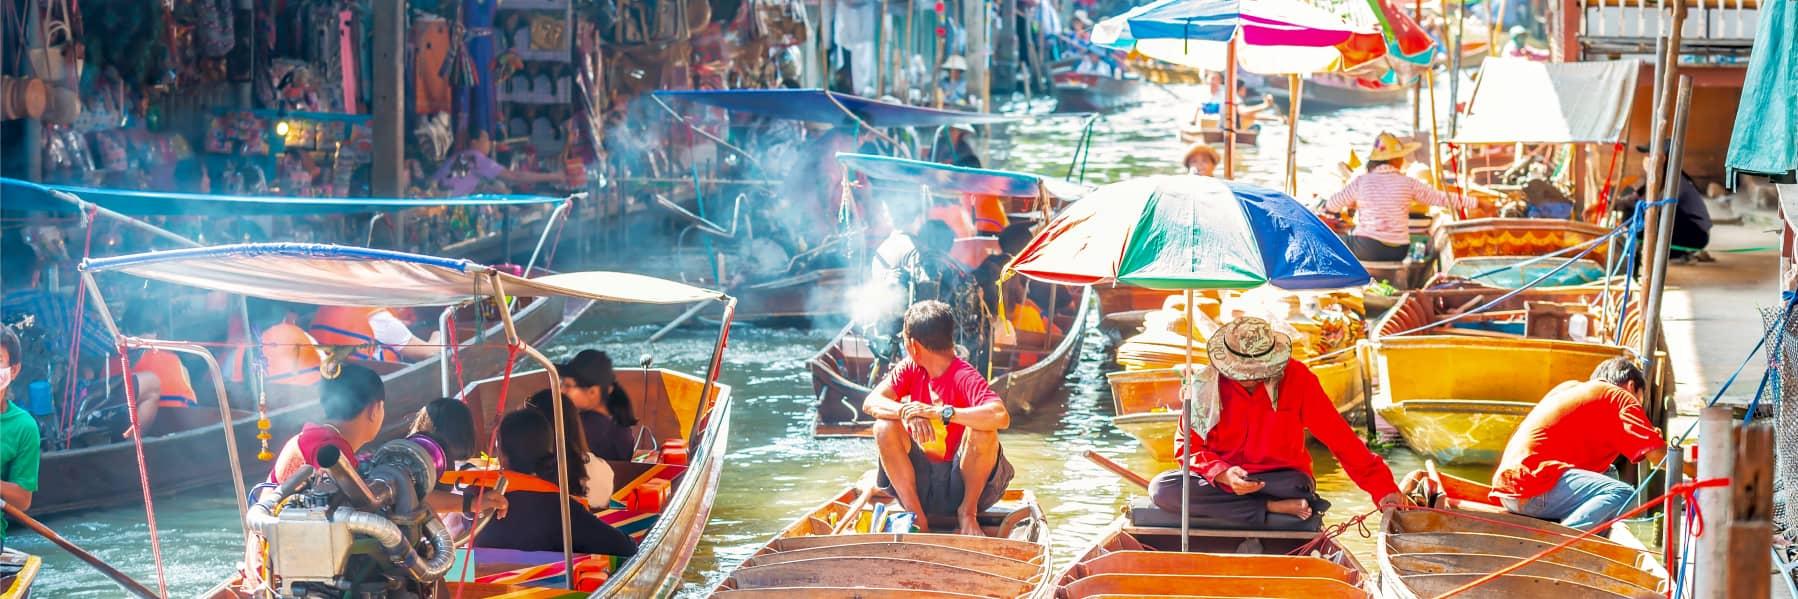 Damnoen Floating Market & Maeklong Railway Market Small Group Tour – Full Day gallery